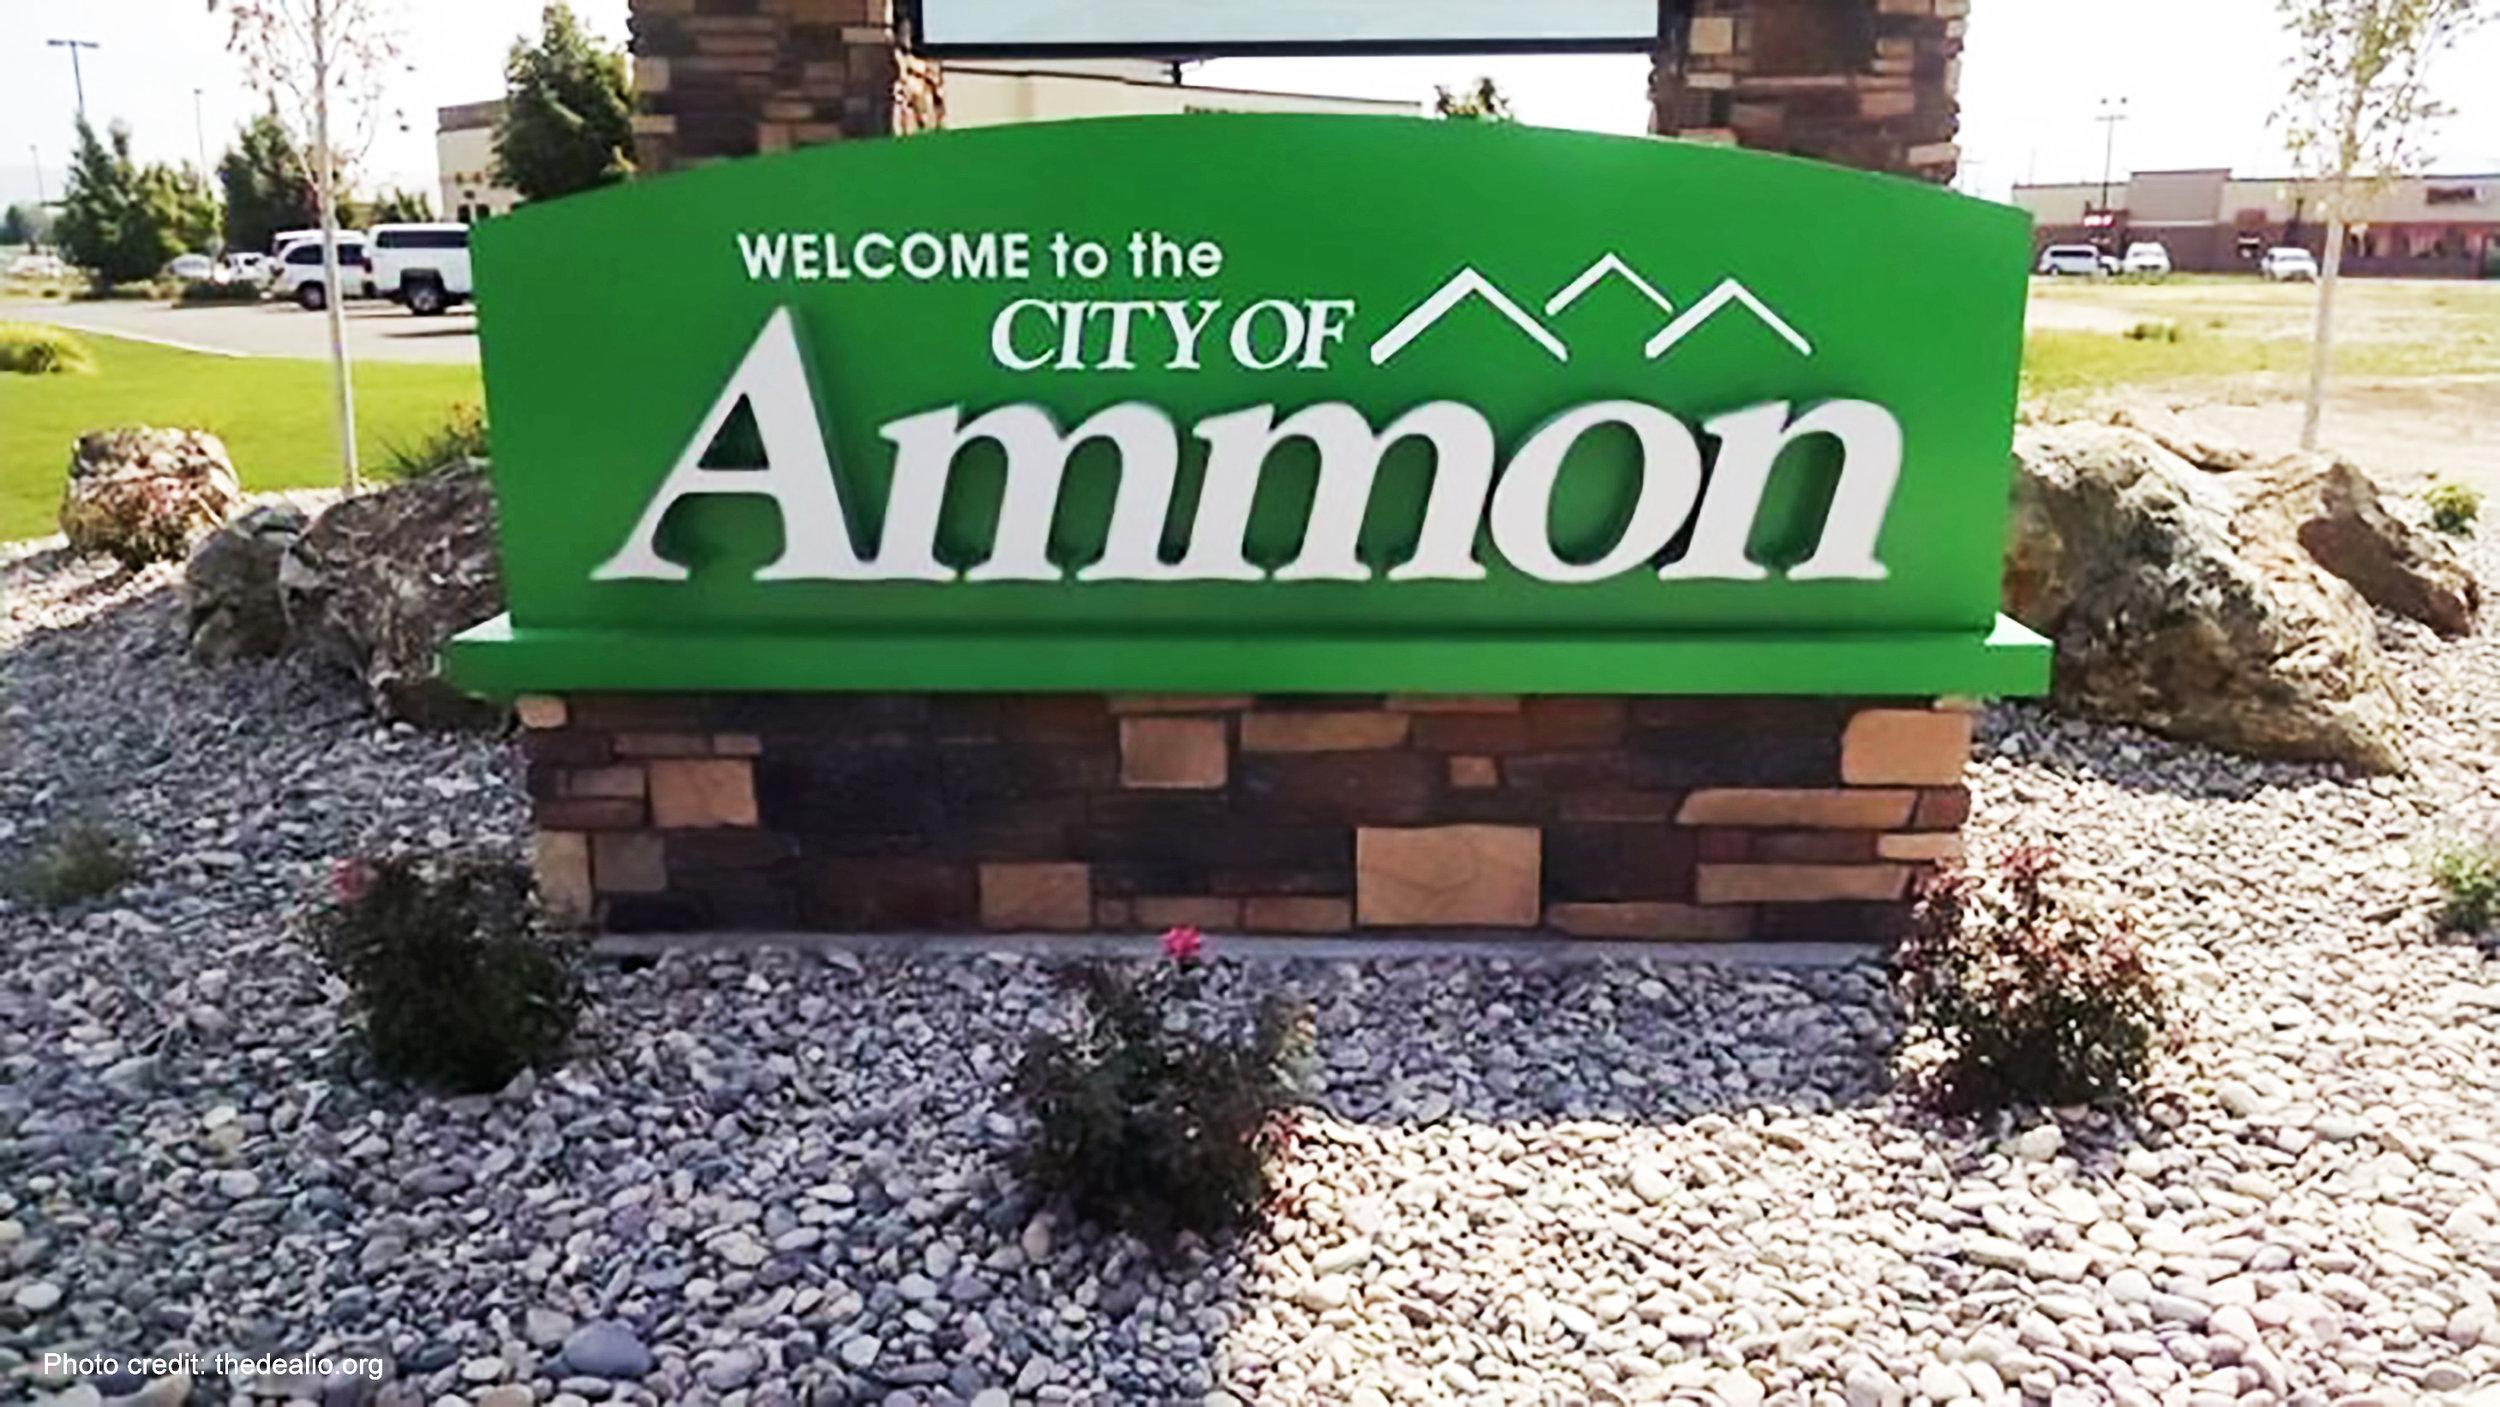 City_of_Ammon_Idaho.jpg